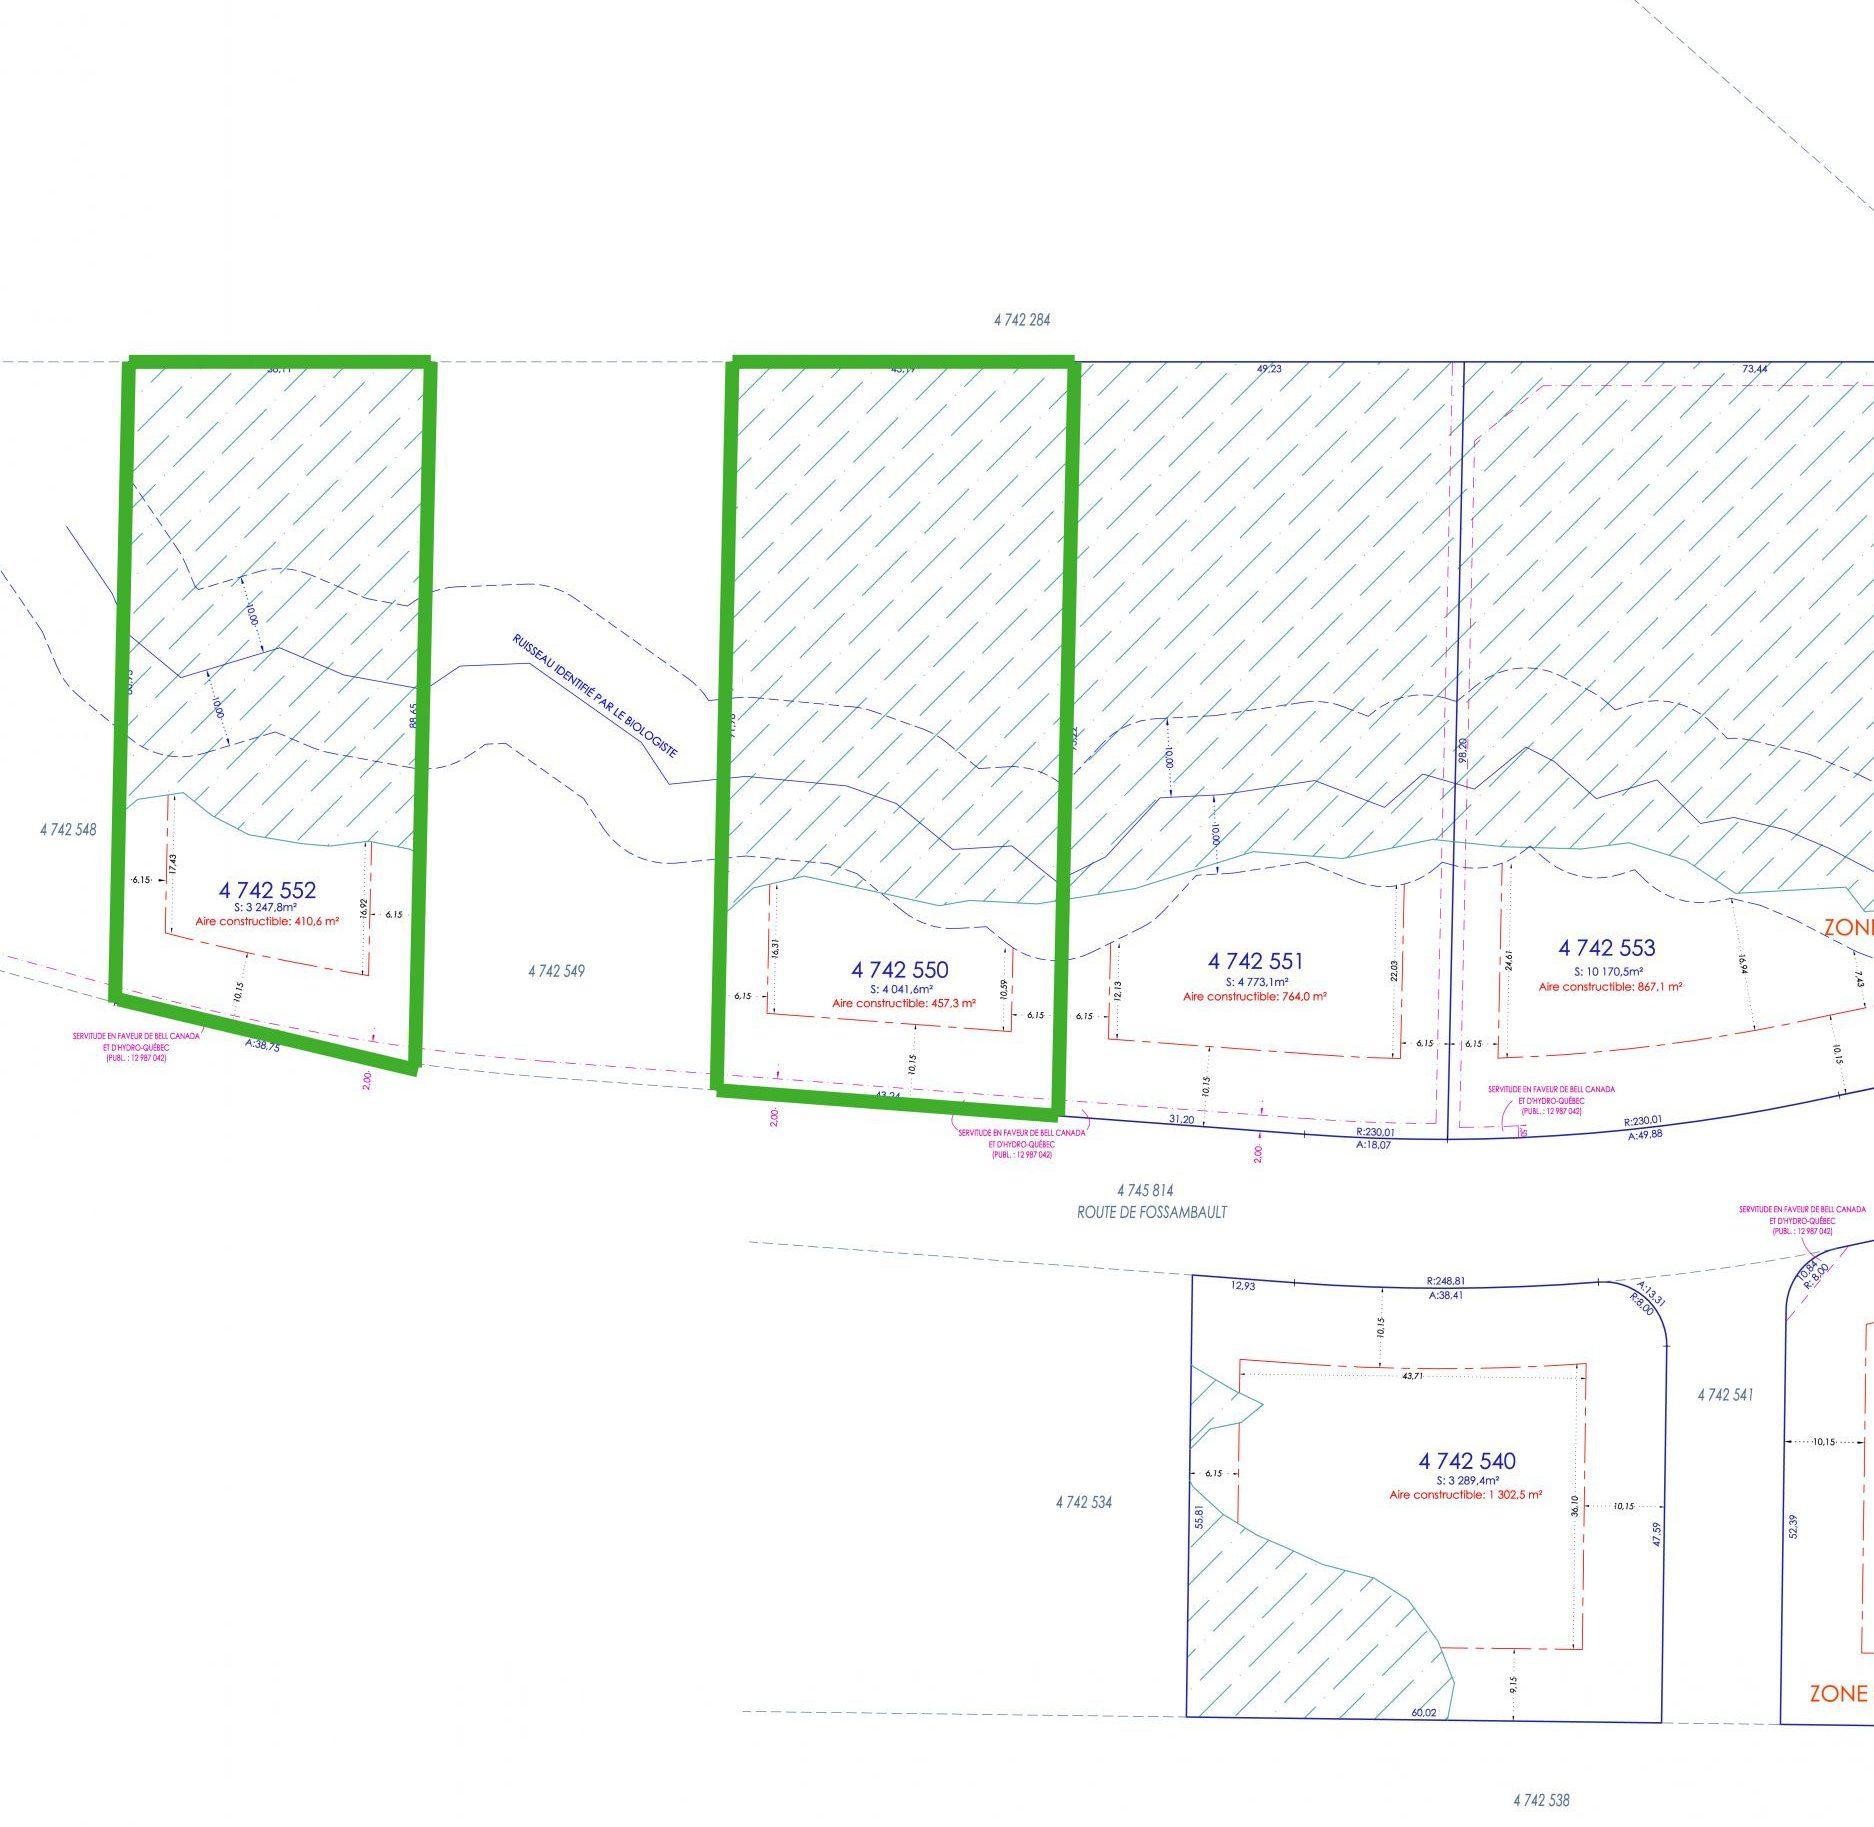 Cadastre (plans) de terrains